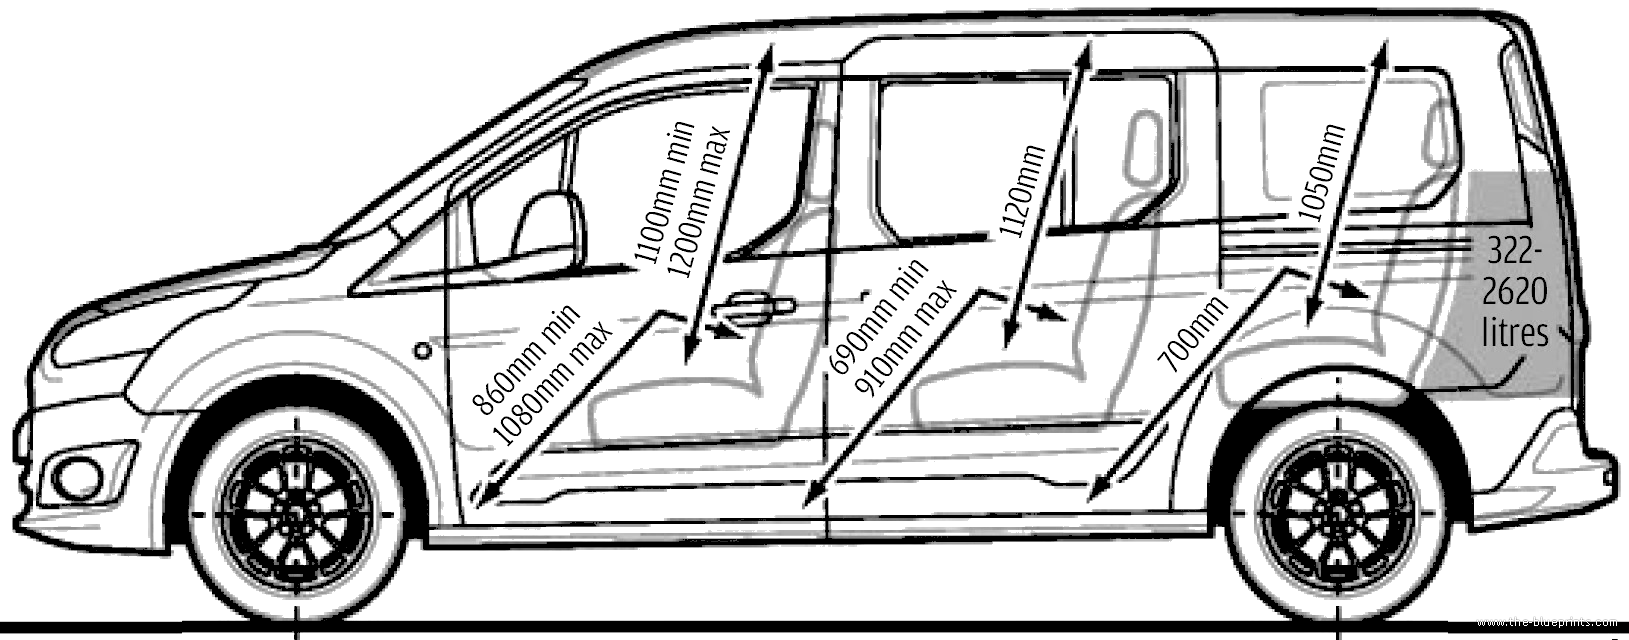 The-Blueprints.com - Blueprints > Cars > Ford > Ford Grand ...